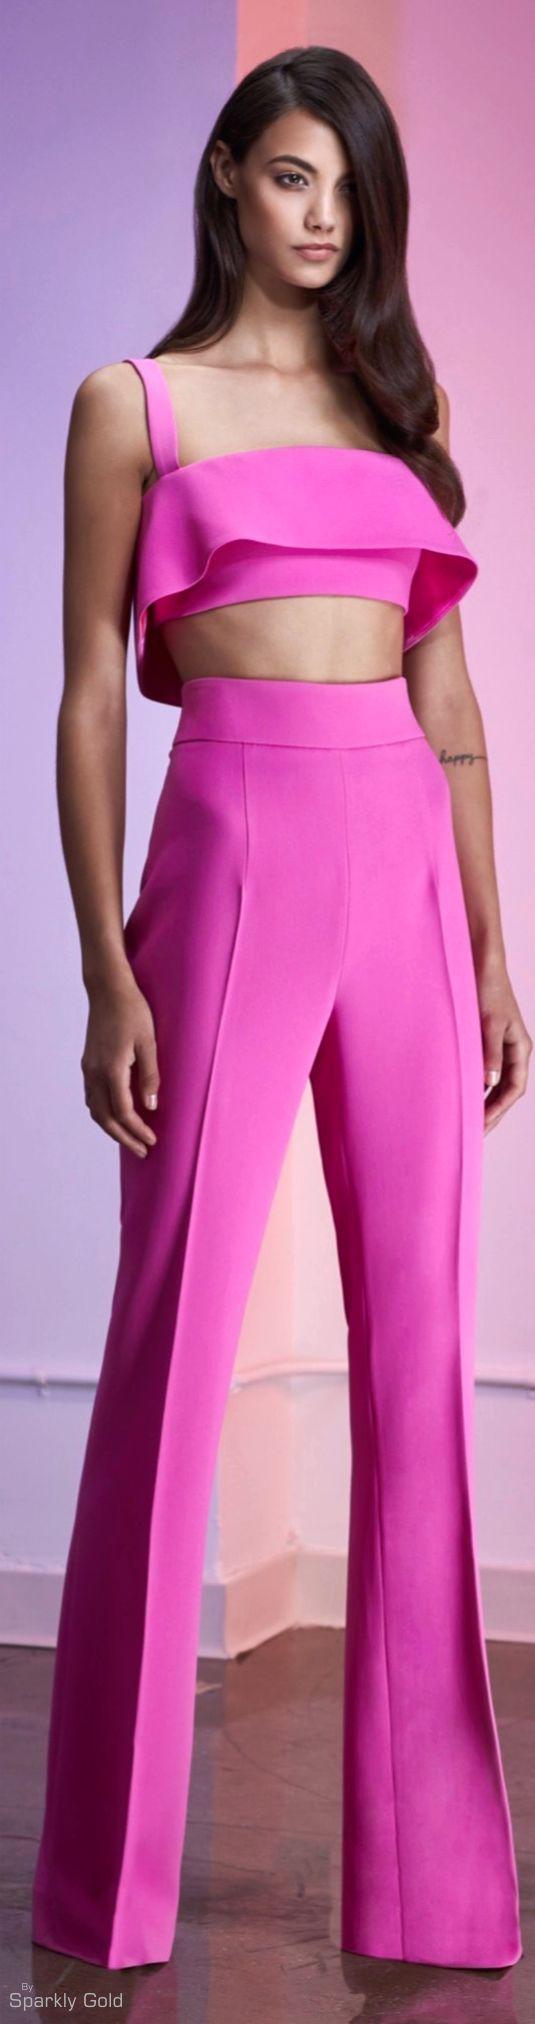 17 Best ideas about Pink Jumpsuit 2017 on Pinterest | Neon ...